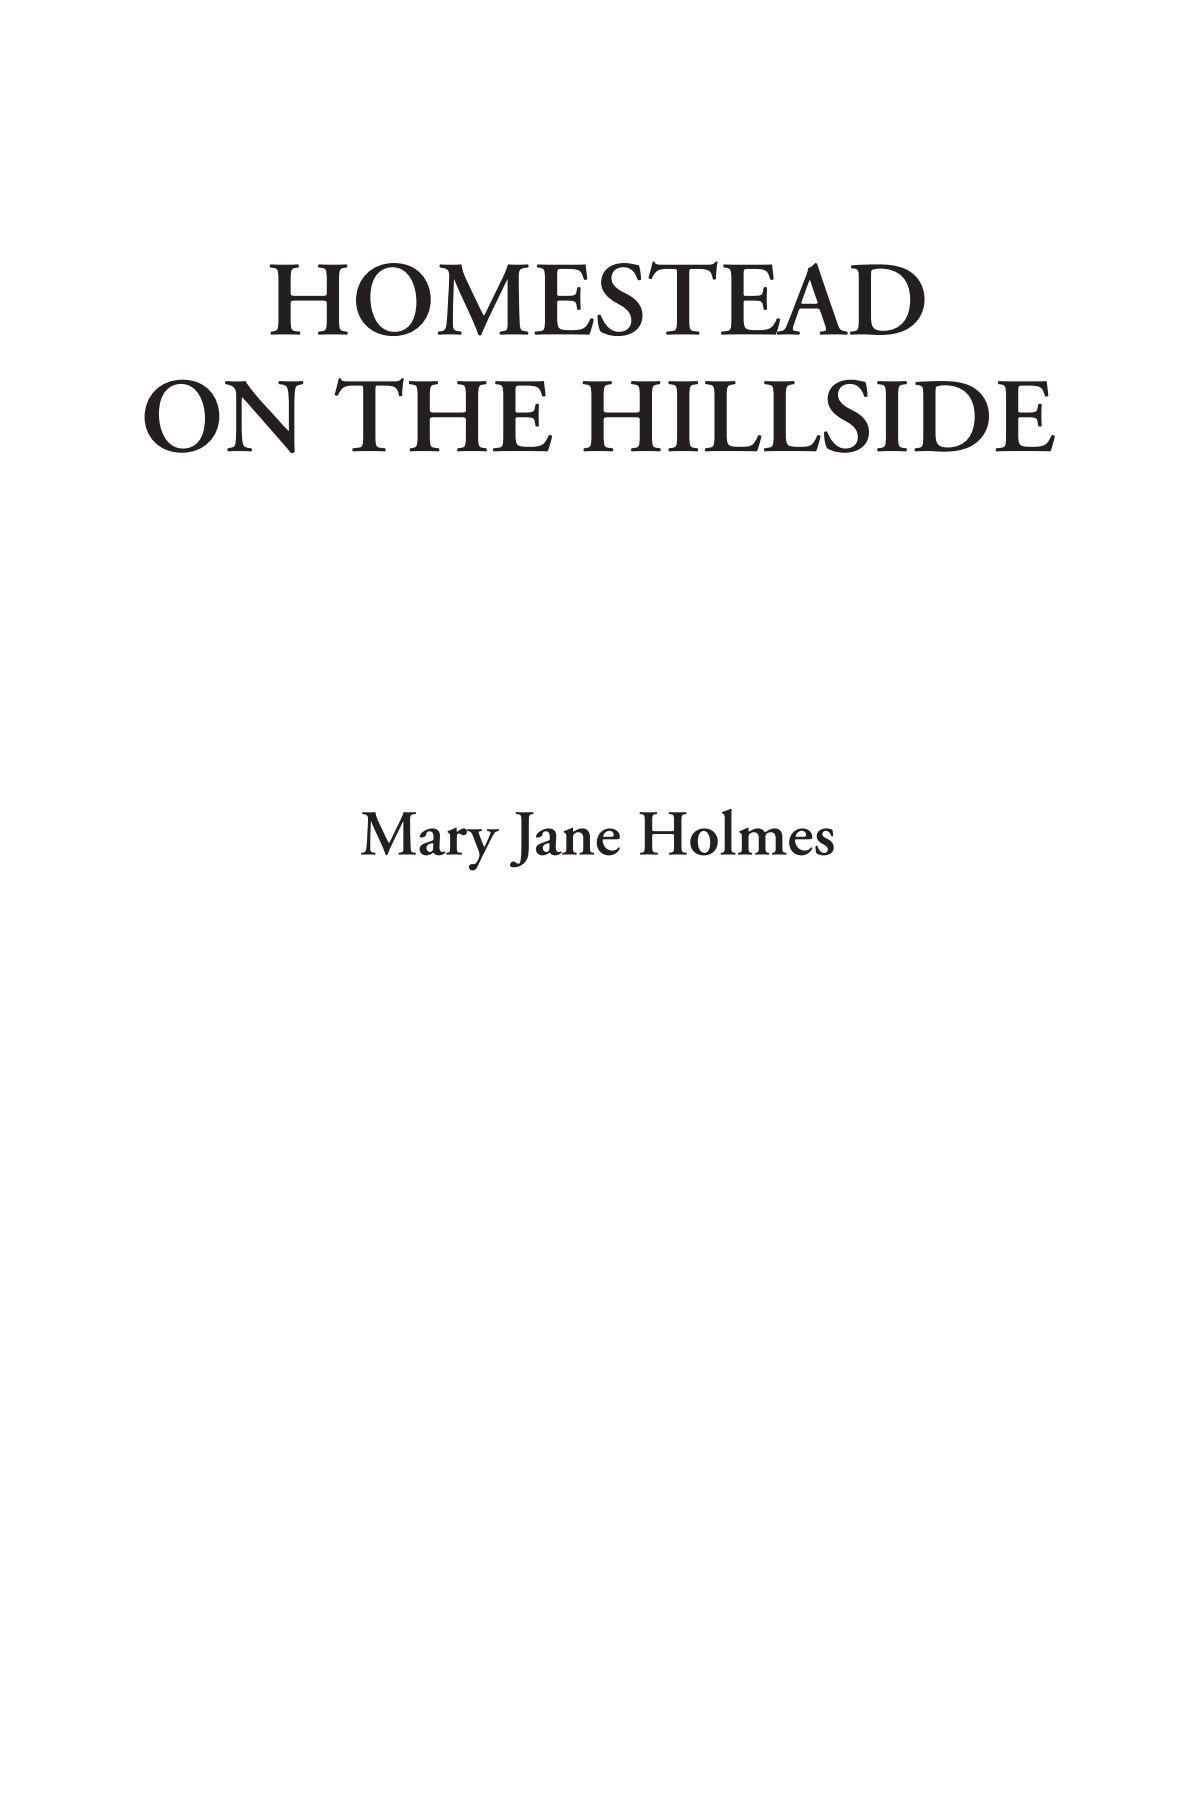 Download Homestead on the Hillside PDF